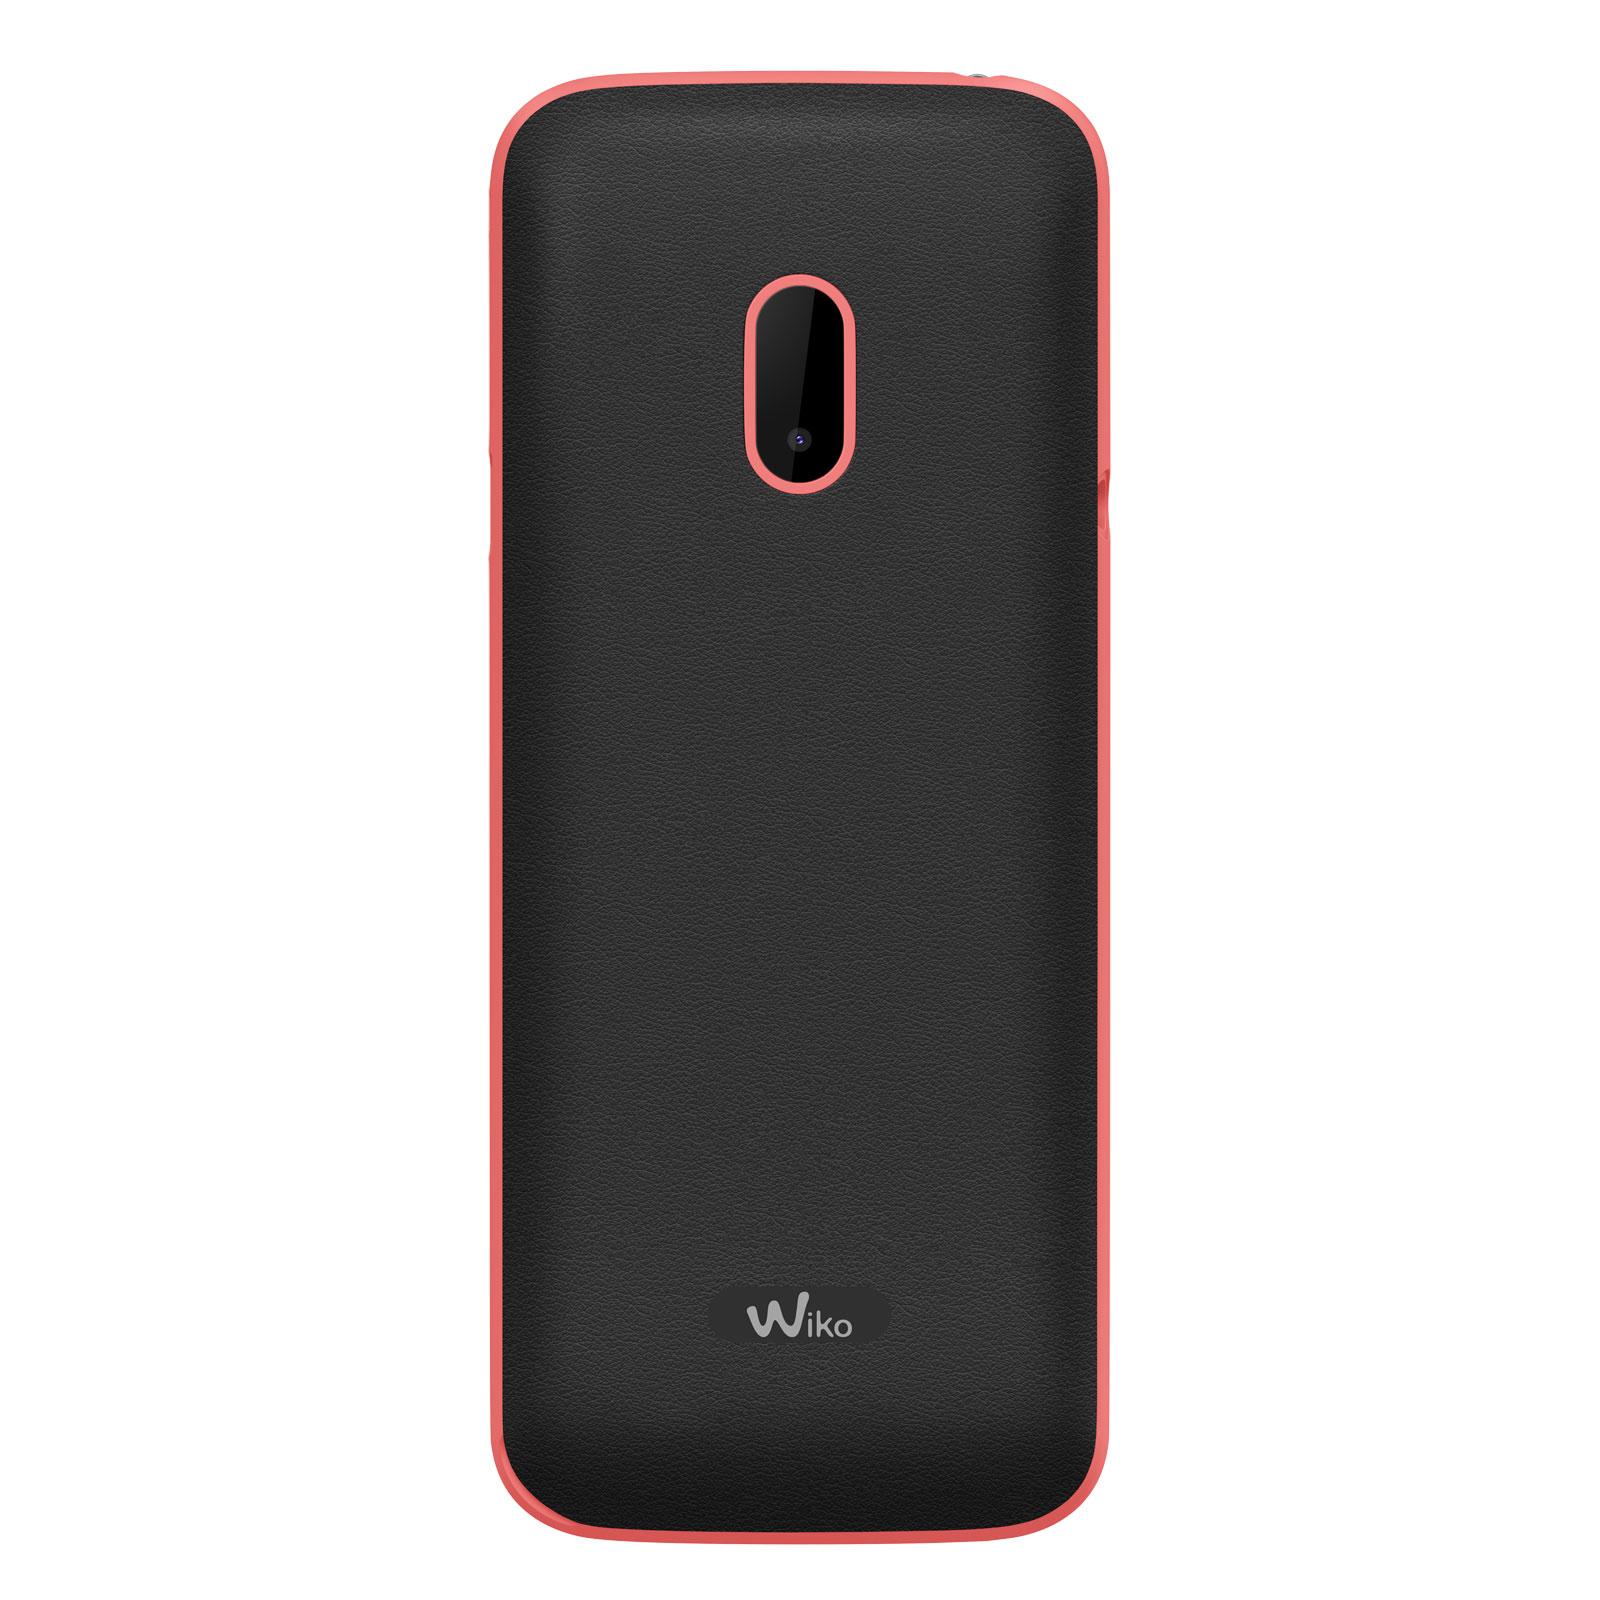 Wiko lubi 4 noir rose mobile smartphone wiko sur for Photo ecran wiko